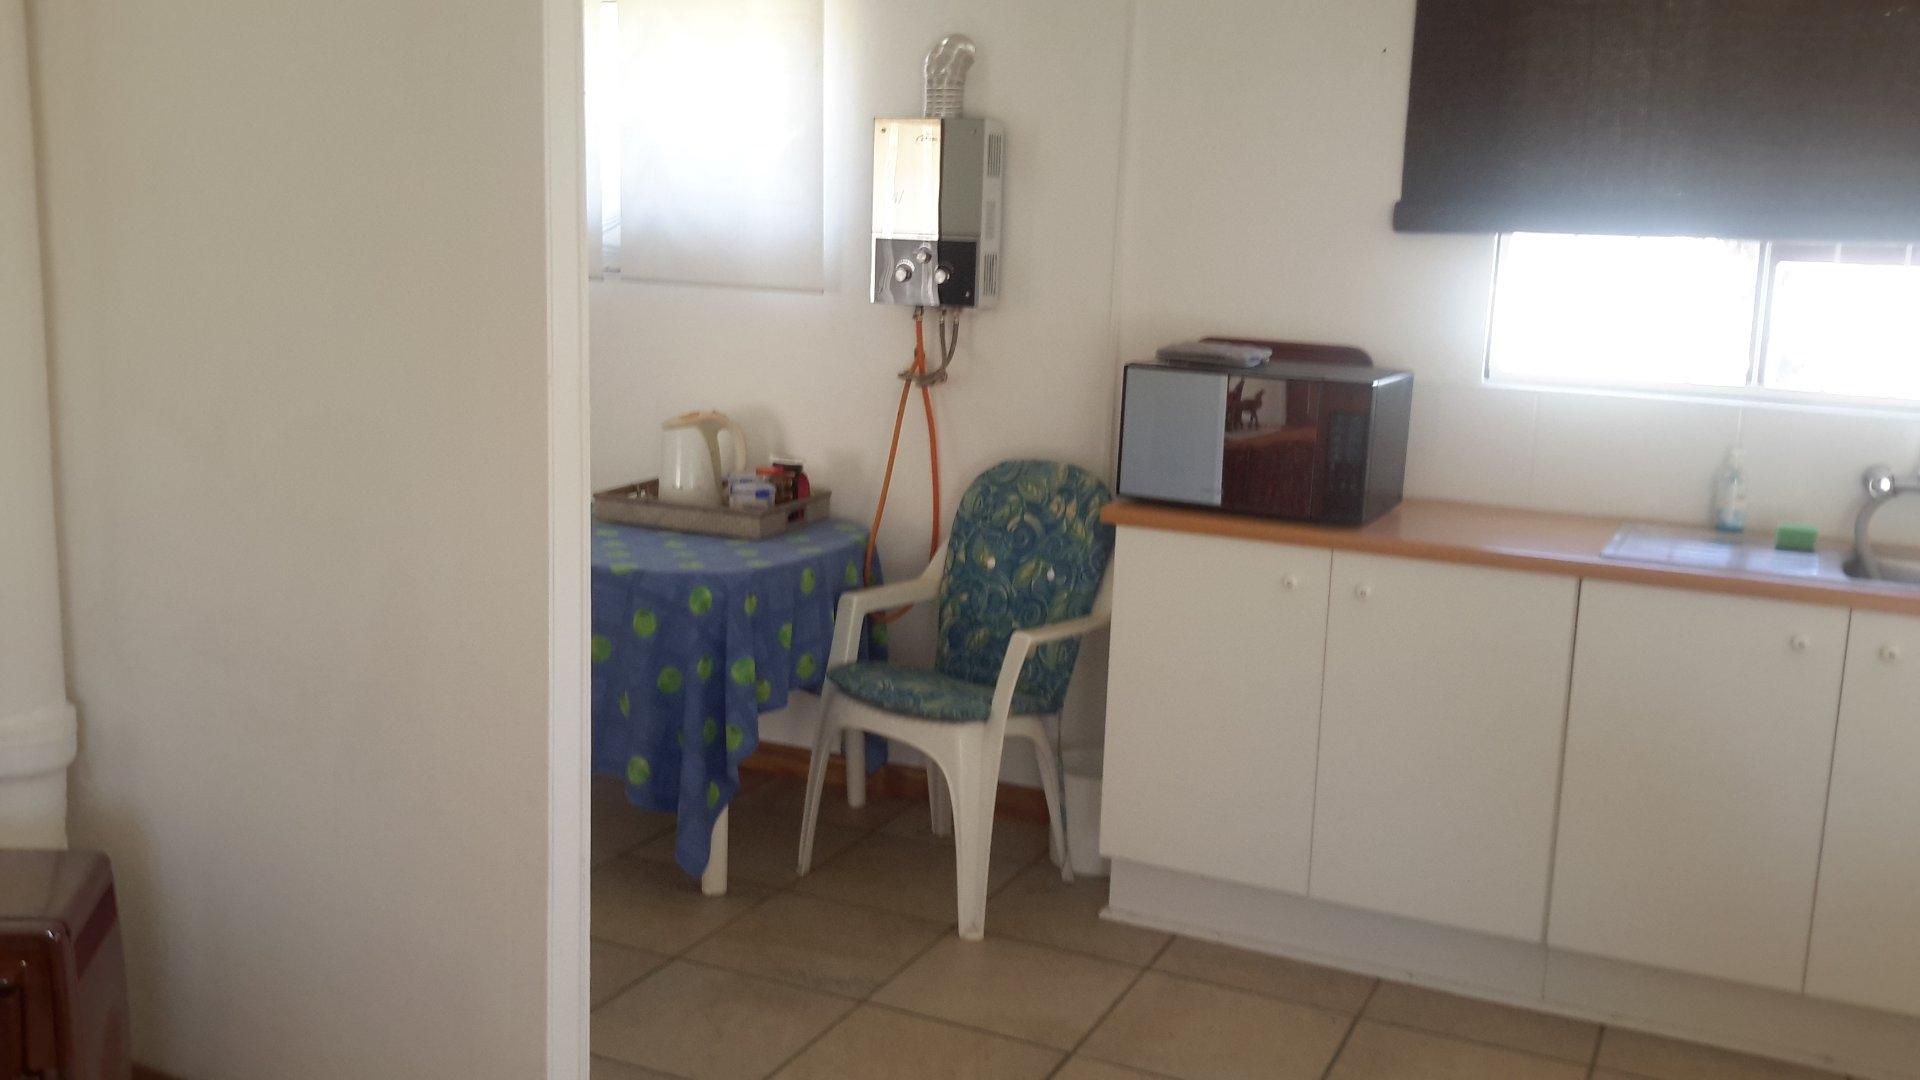 Flatlet kitchen area